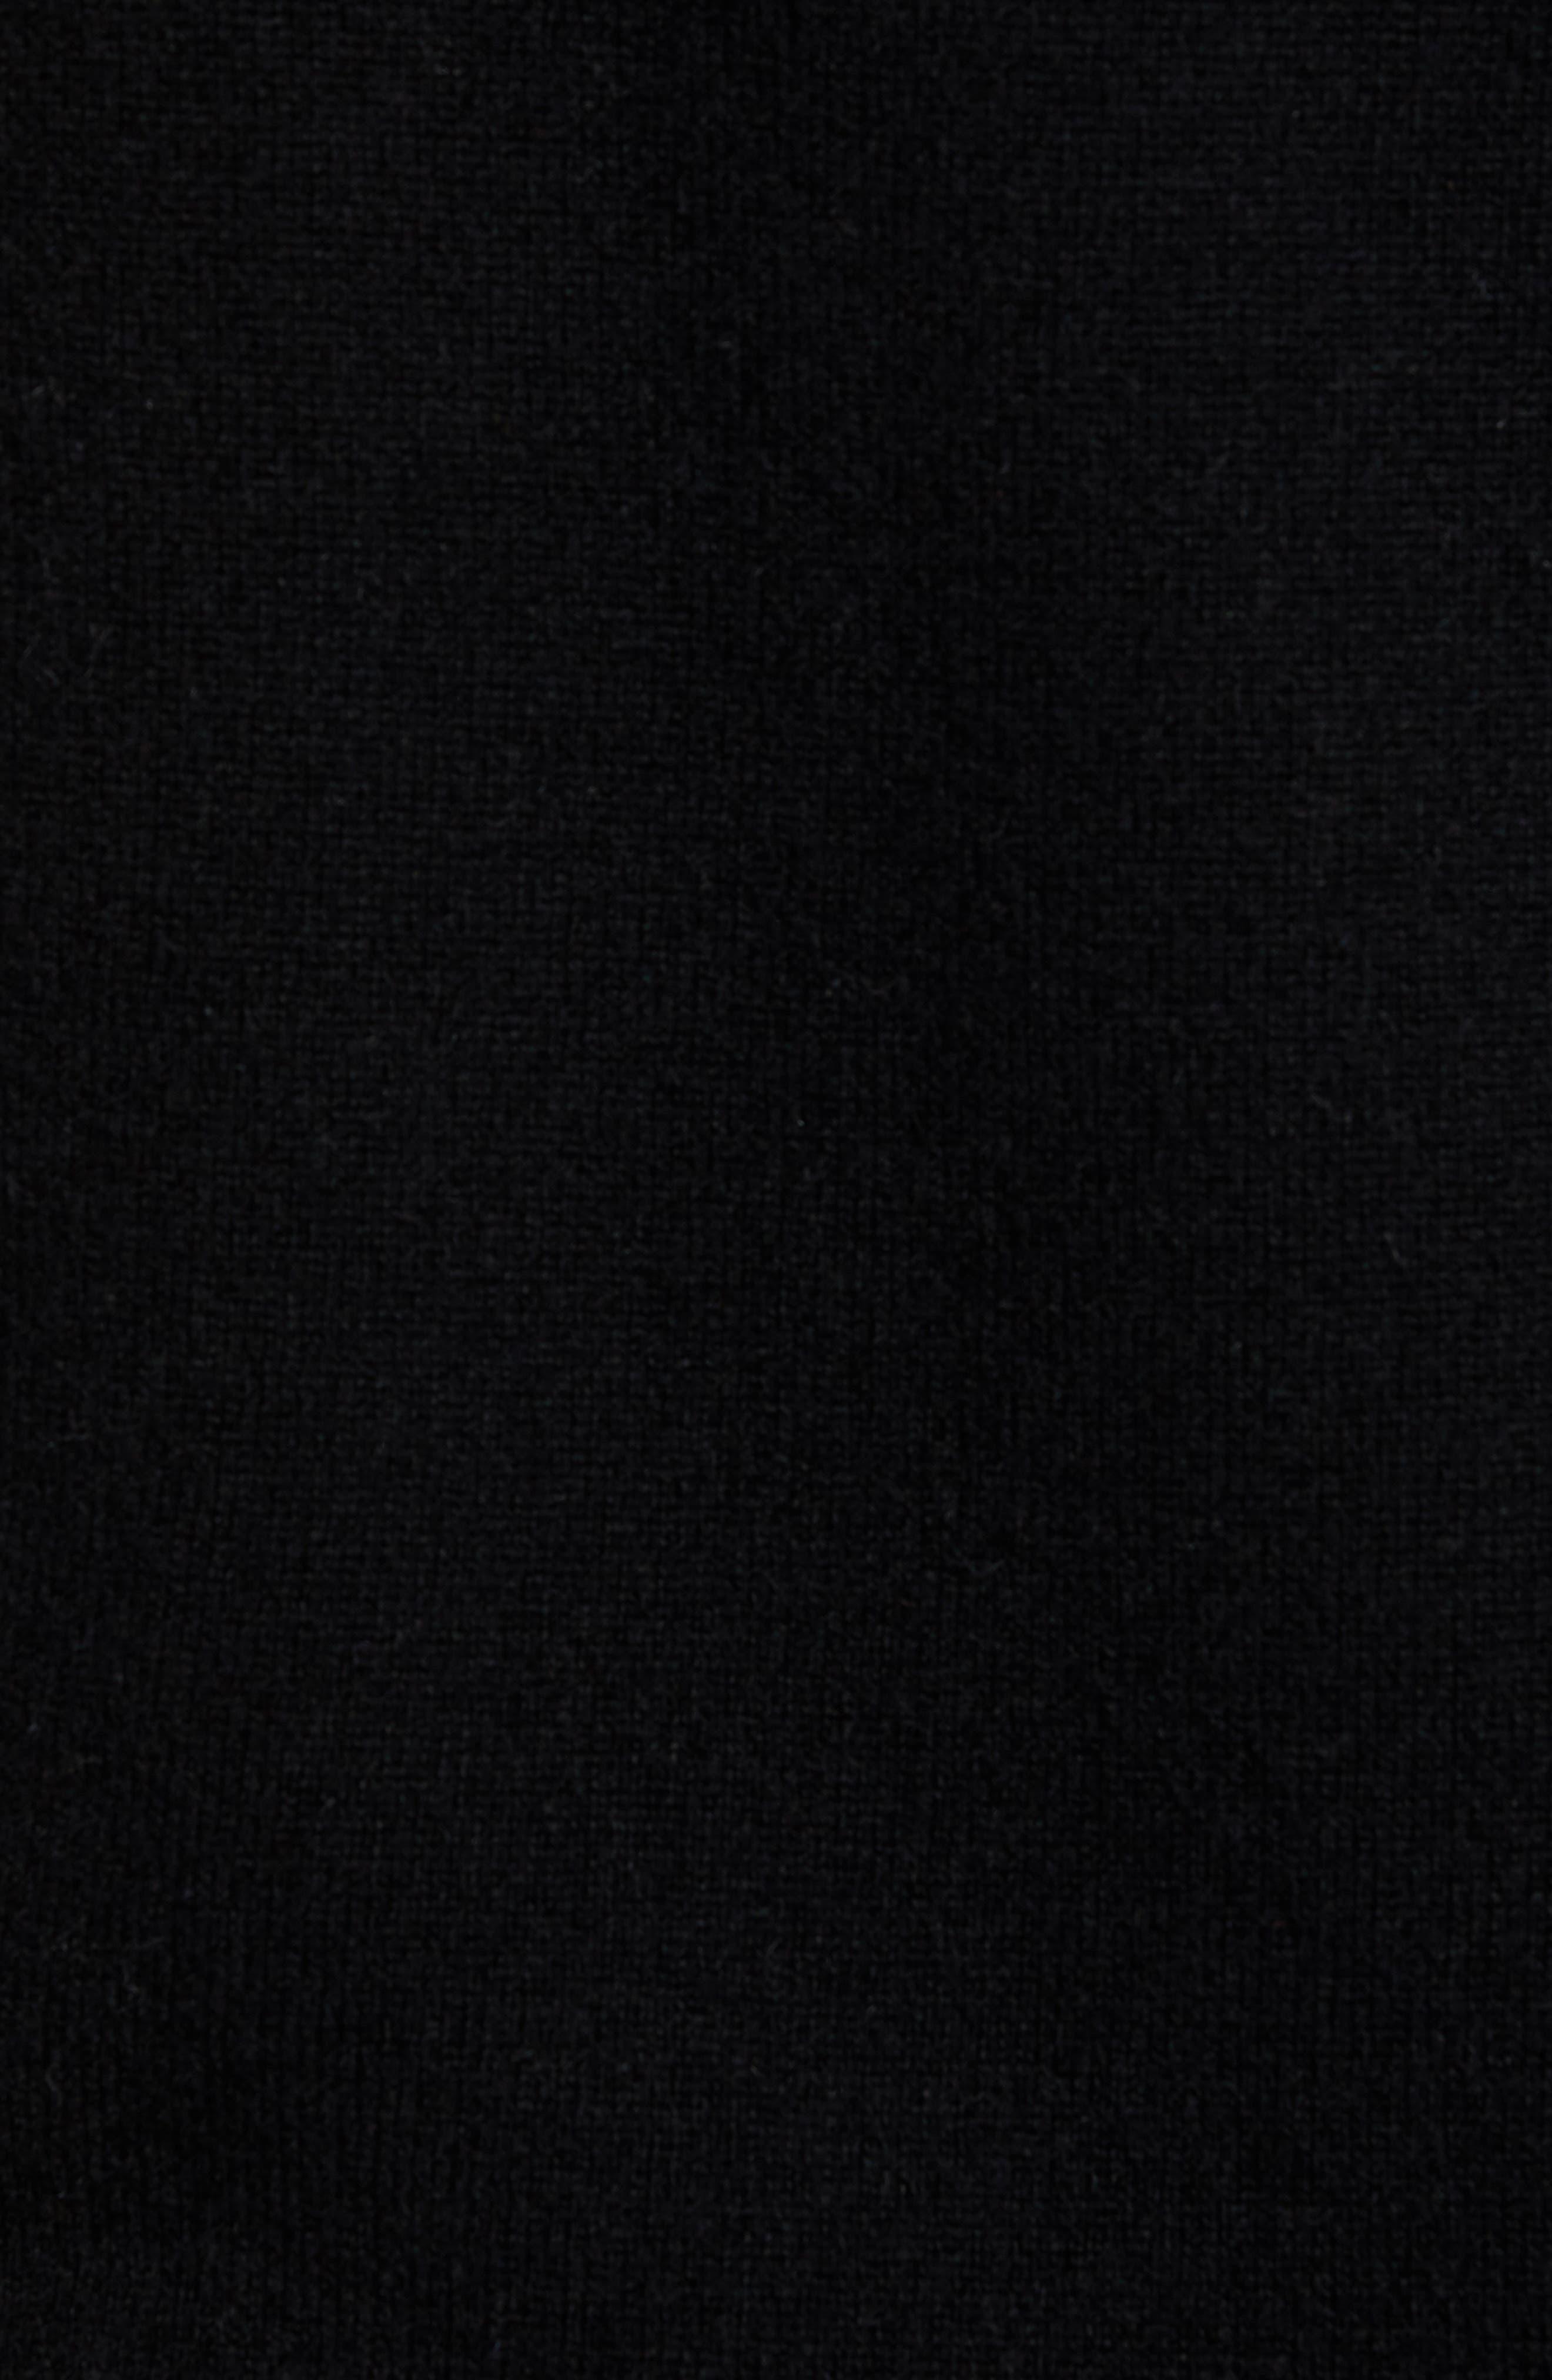 Cashmere V-Neck Sweater,                             Alternate thumbnail 5, color,                             BLACK CAVIAR